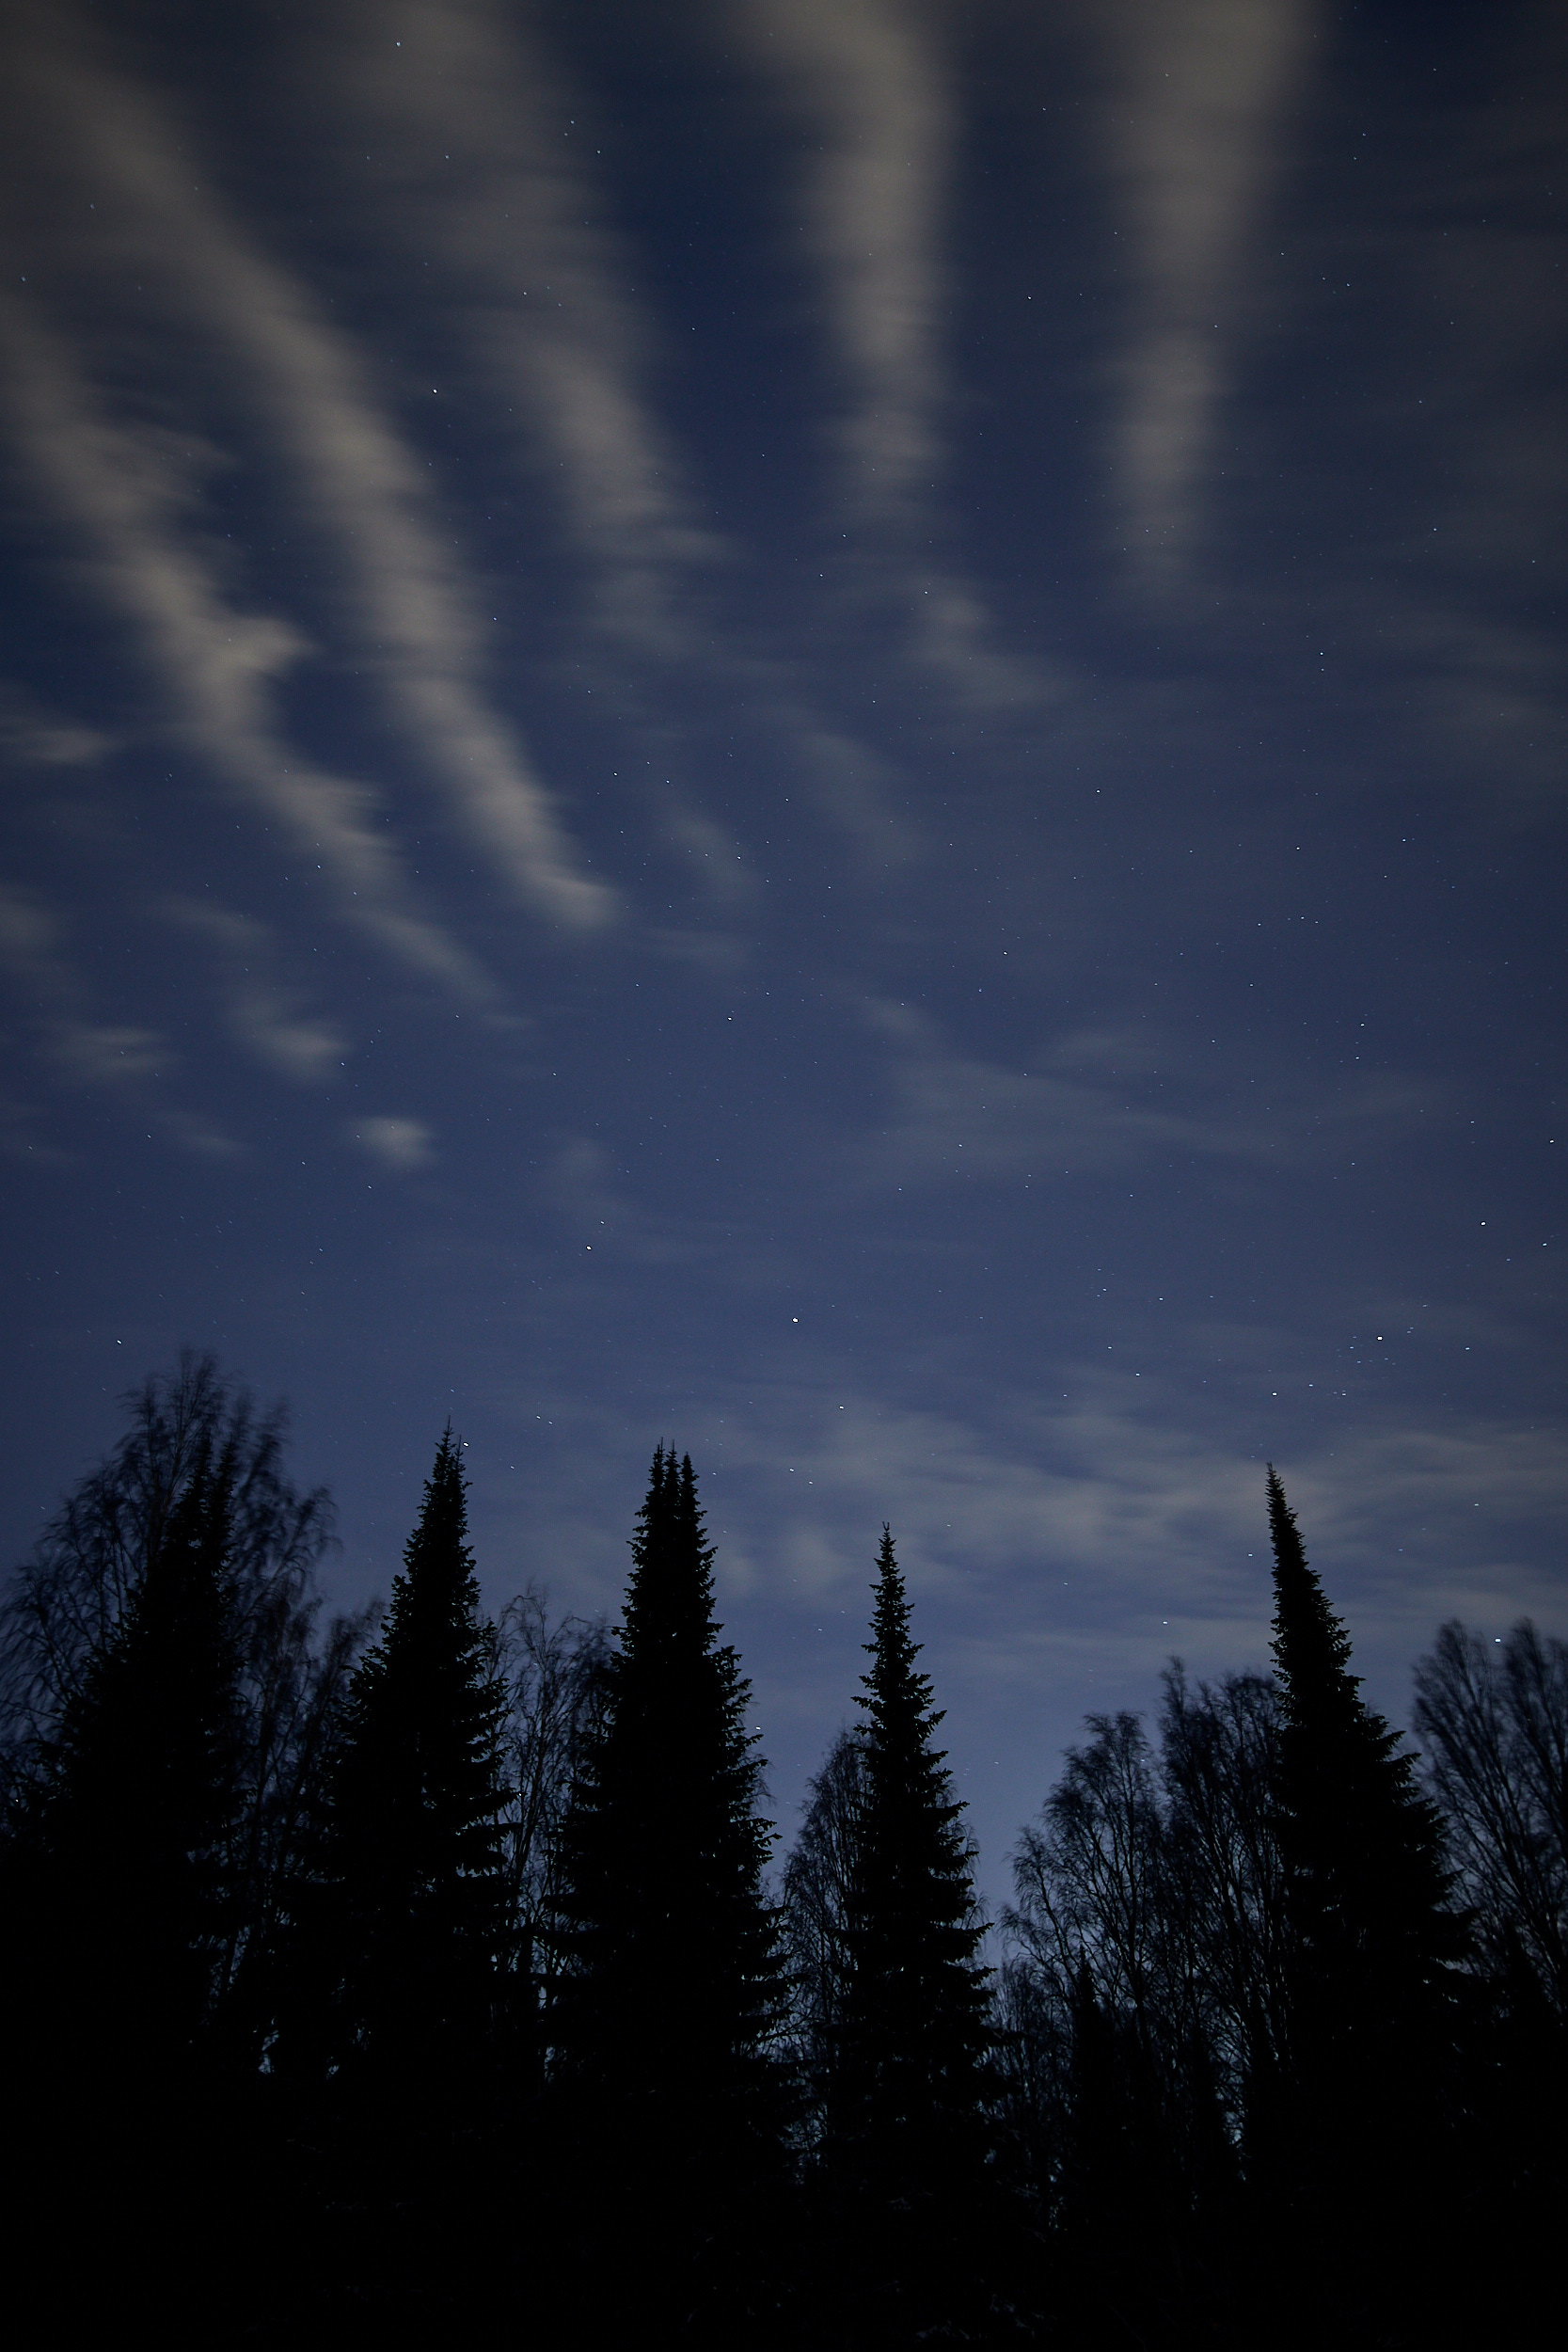 15 mm - 2019-03-12 02.14.14 - Oulu Marvin Timo.jpg